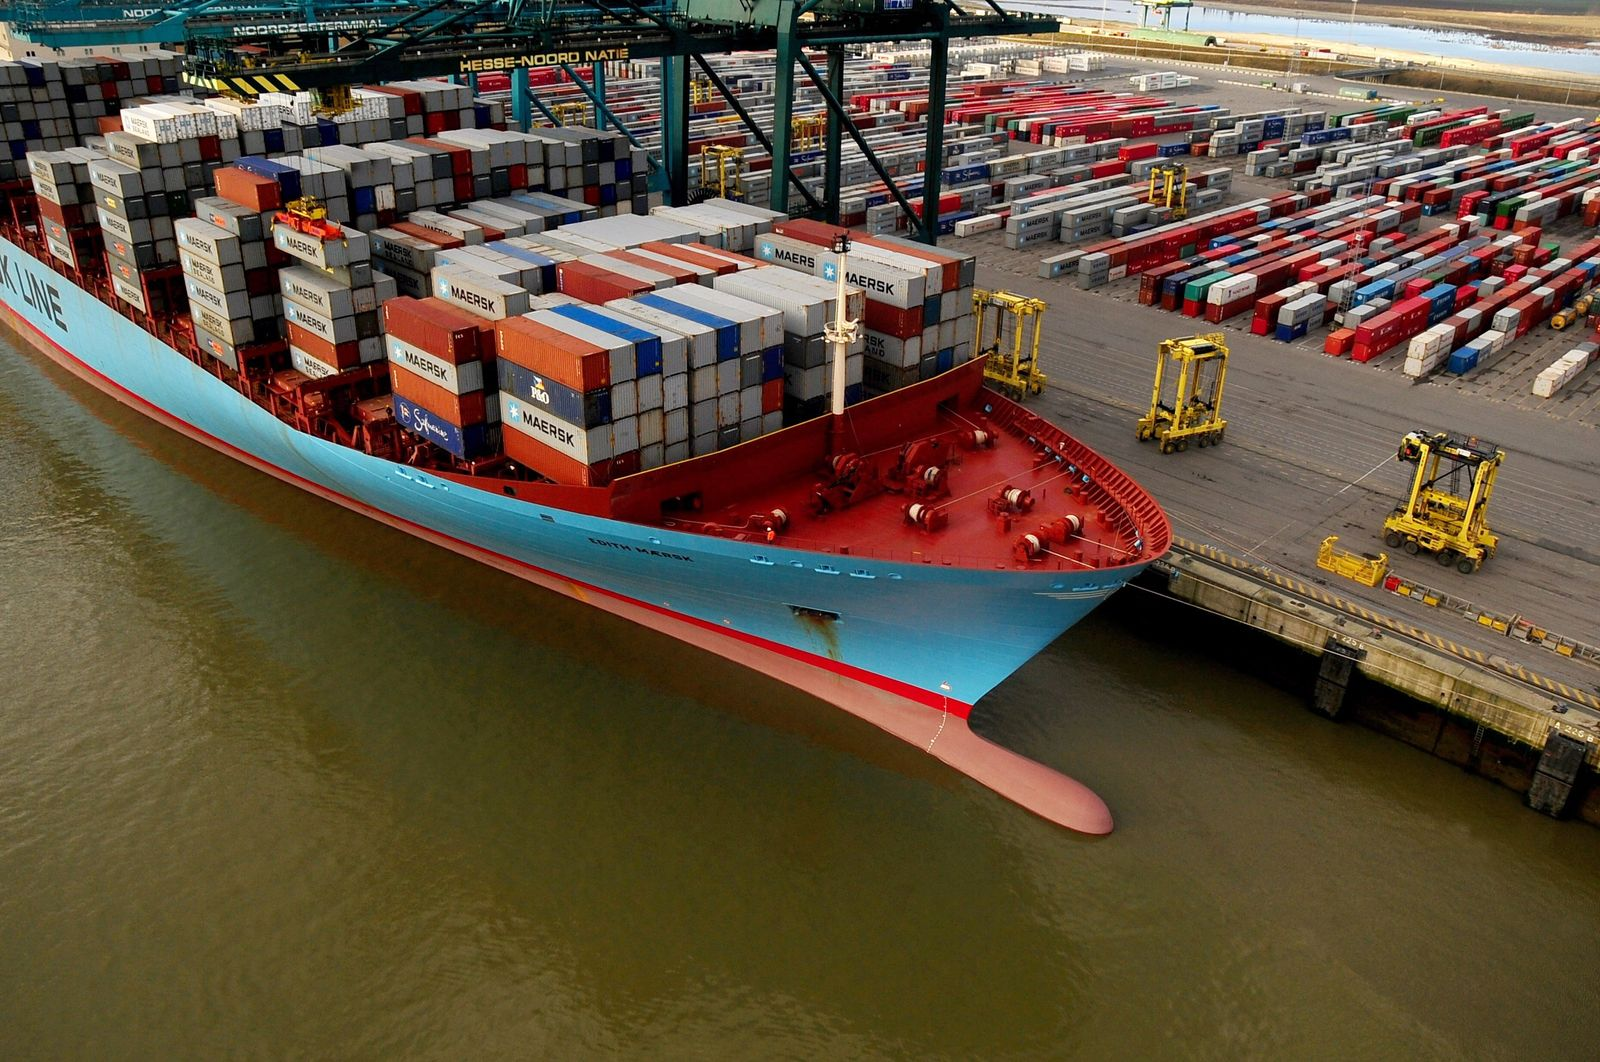 Edith Maersk of the Maersk Line at the Antwerp harbour, in Belgiu